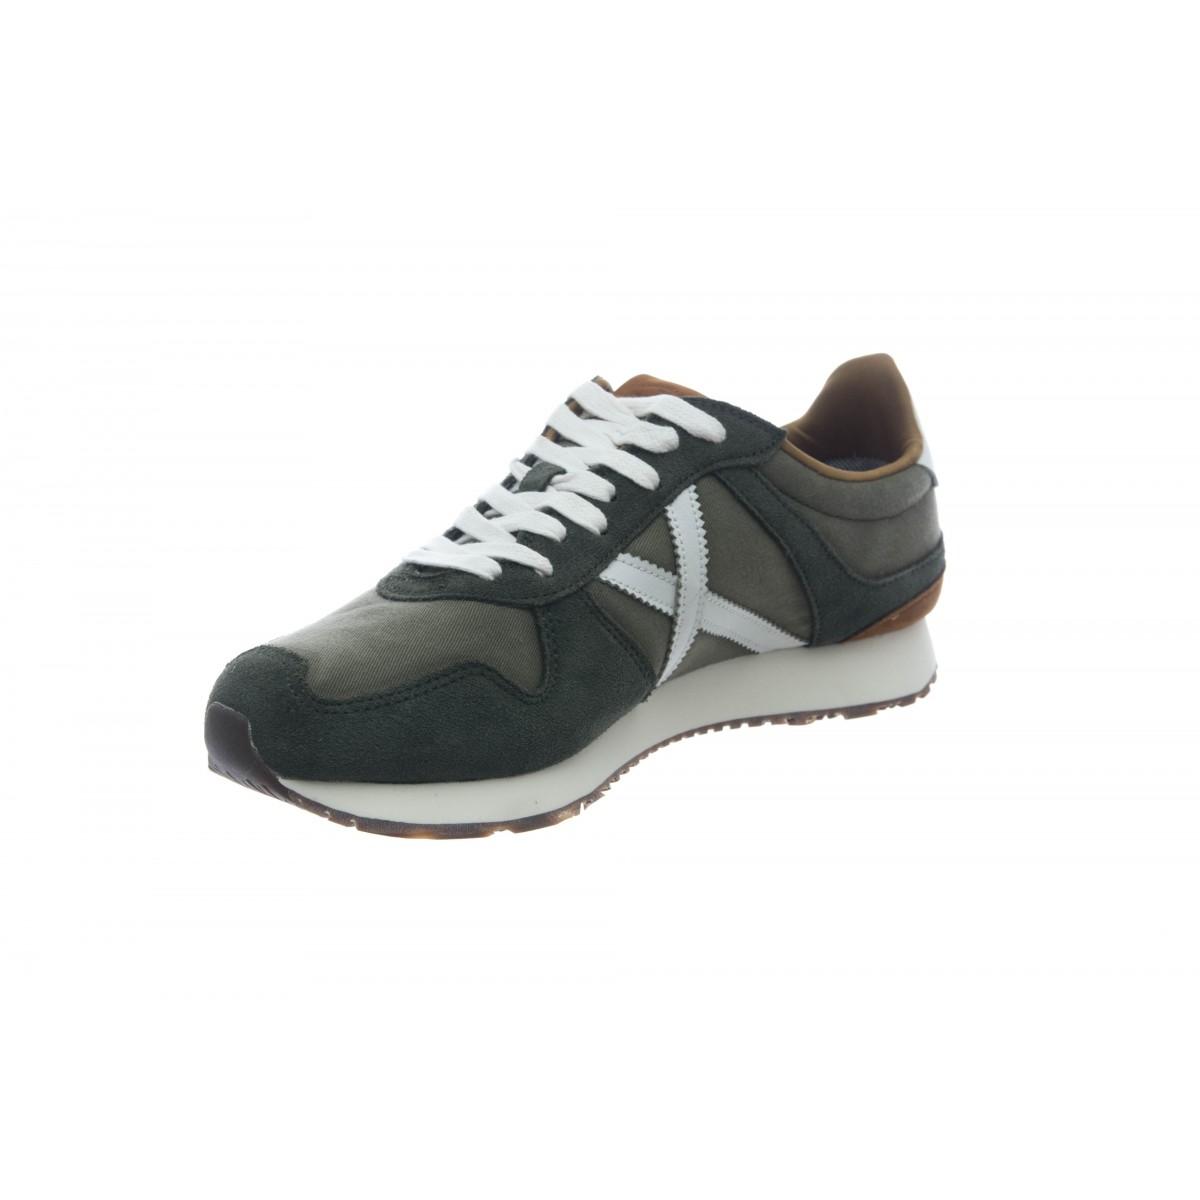 Scarpe - Massana sneakers uomo